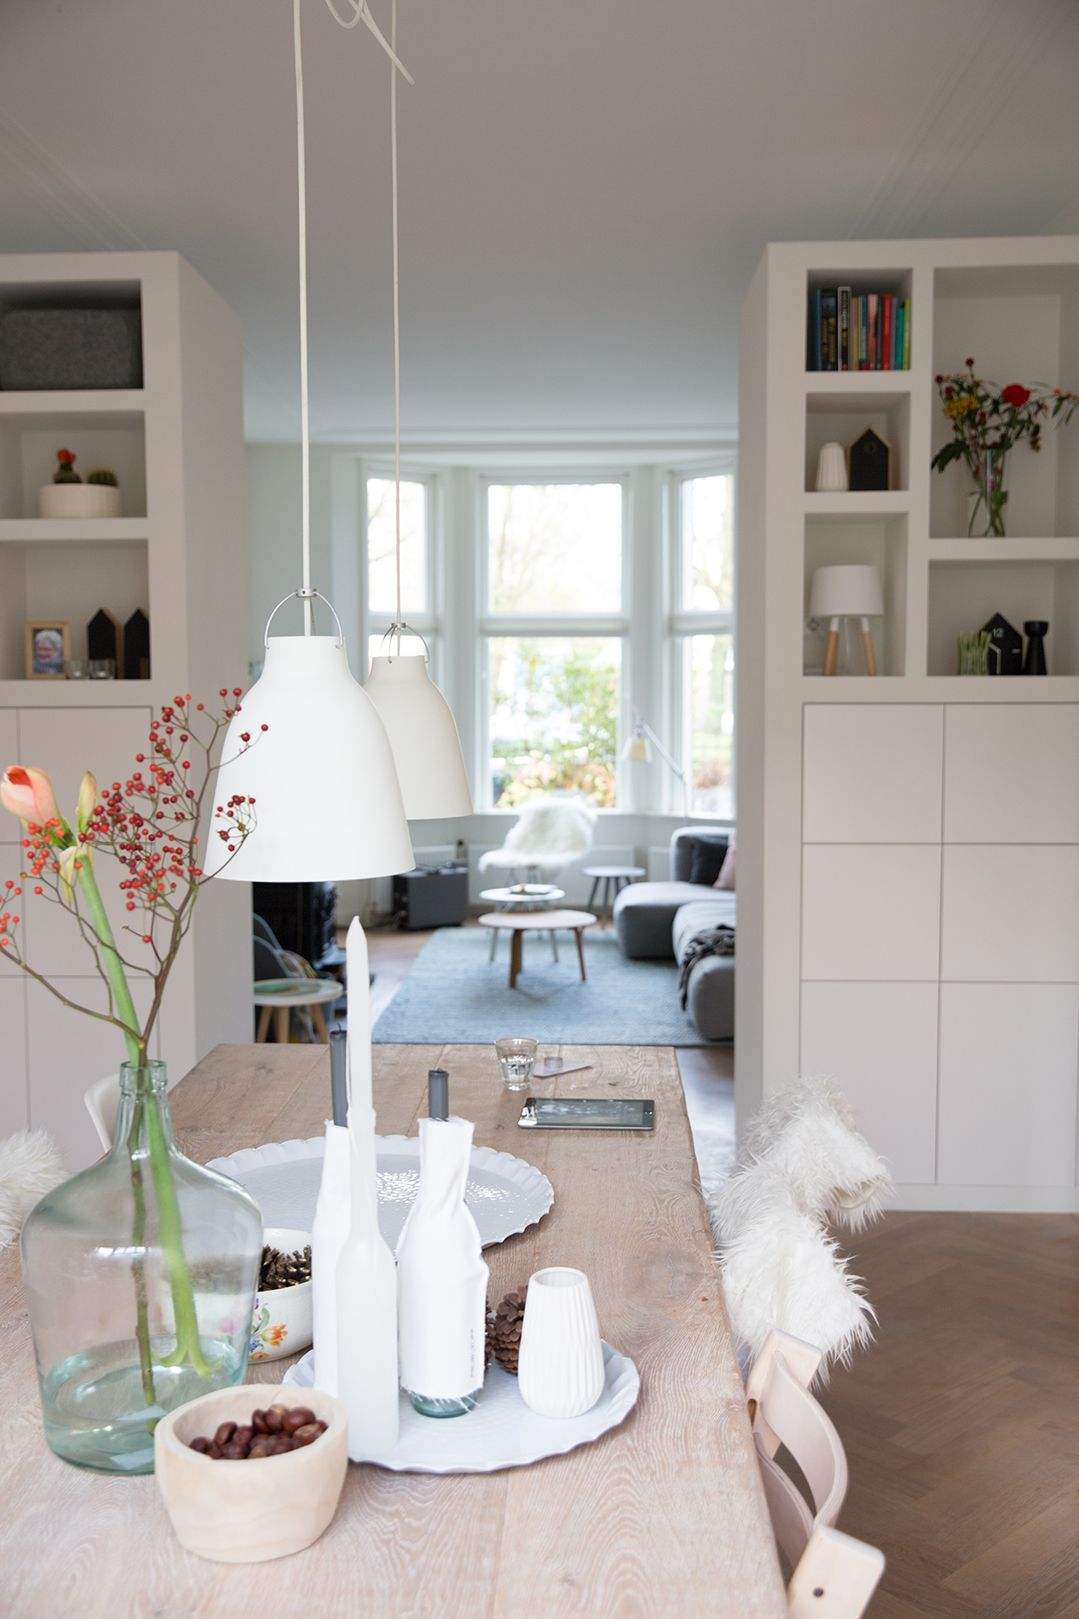 femkeido interior design woonhuis delft living room furniture arrangement living room decor dining